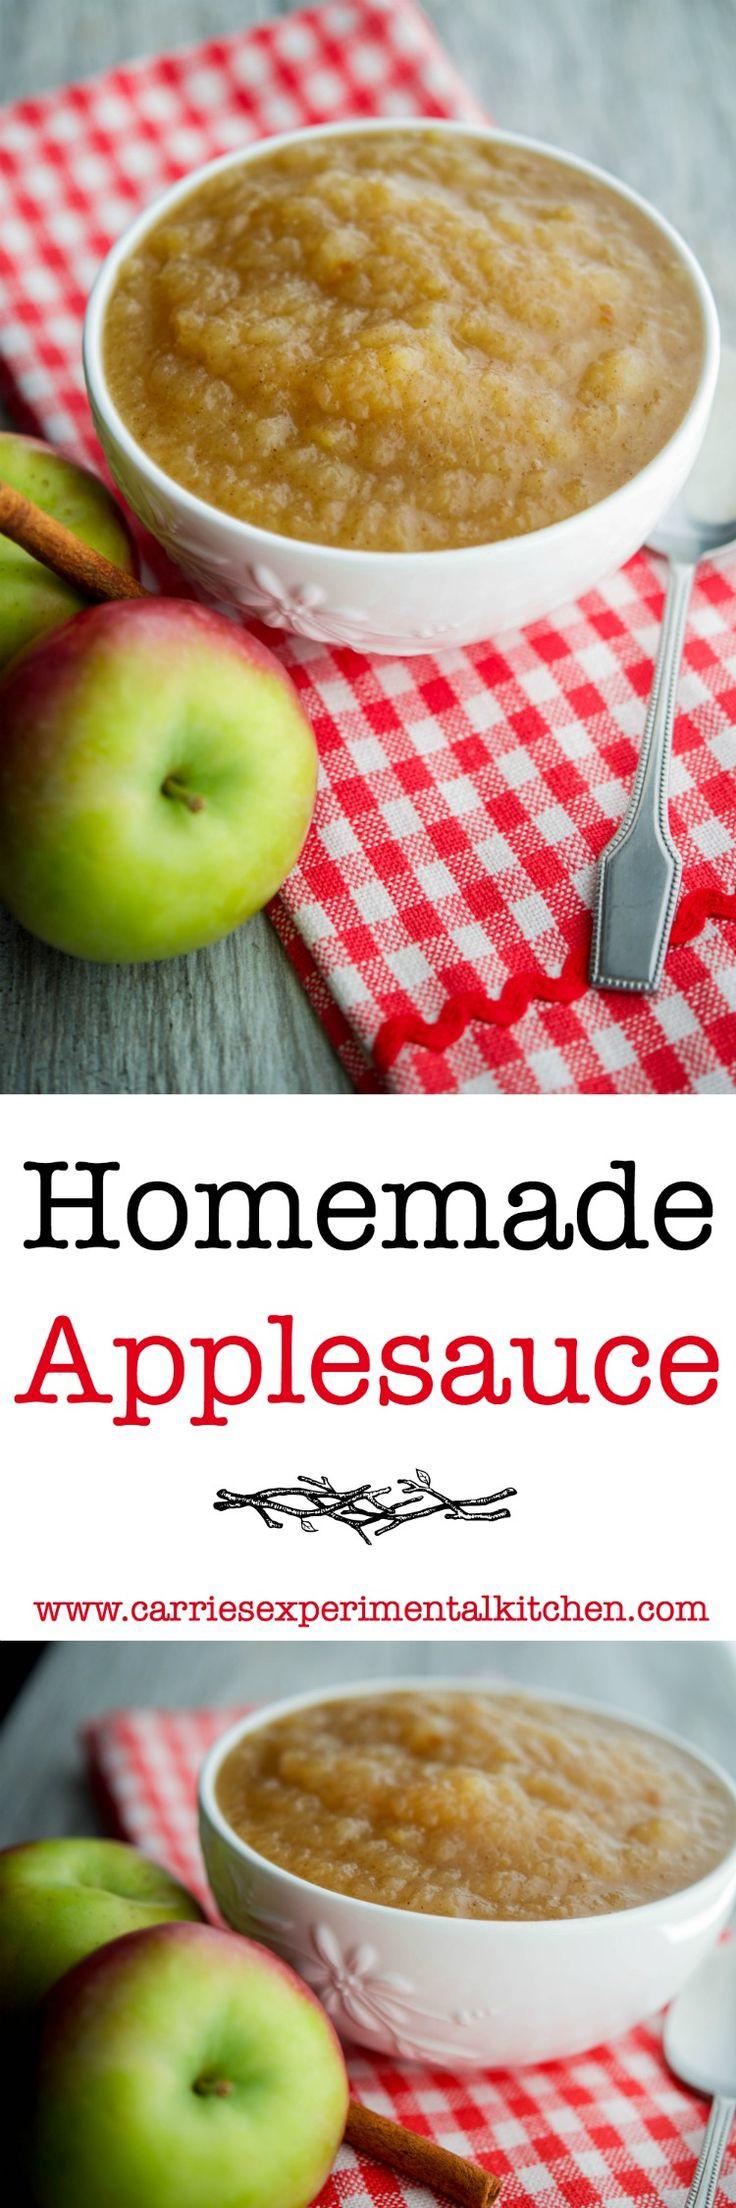 Recipe For Applesauce  Homemade Applesauce Recipe